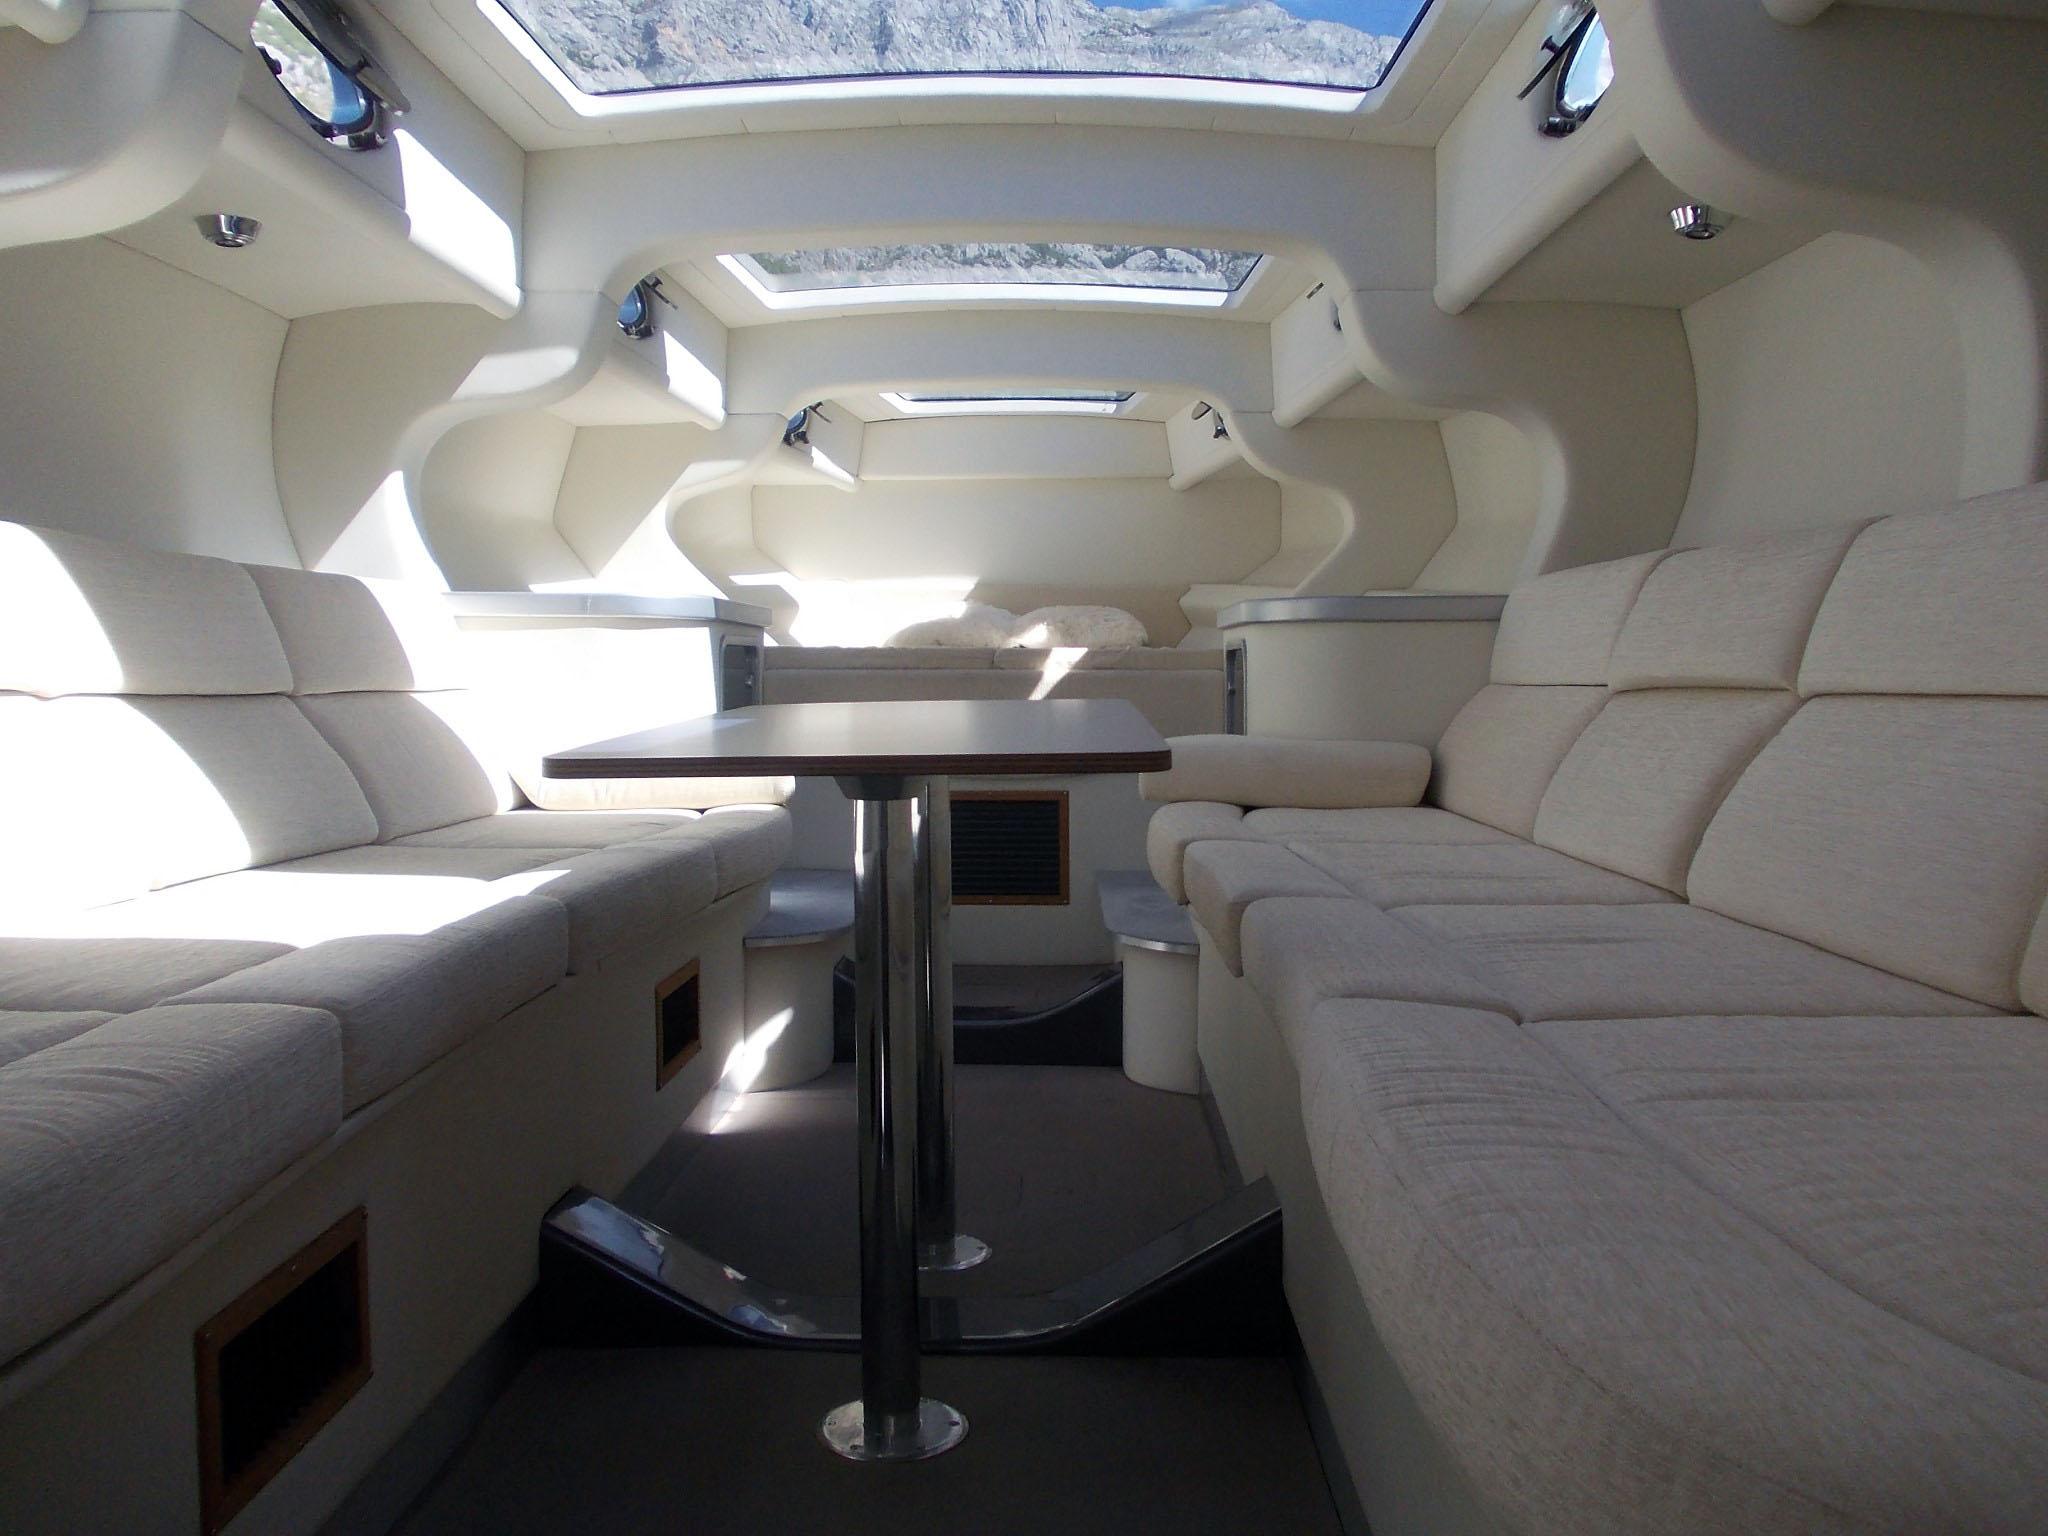 Arredamento di interni yachtpro solutions d o o for Arredamento di interni